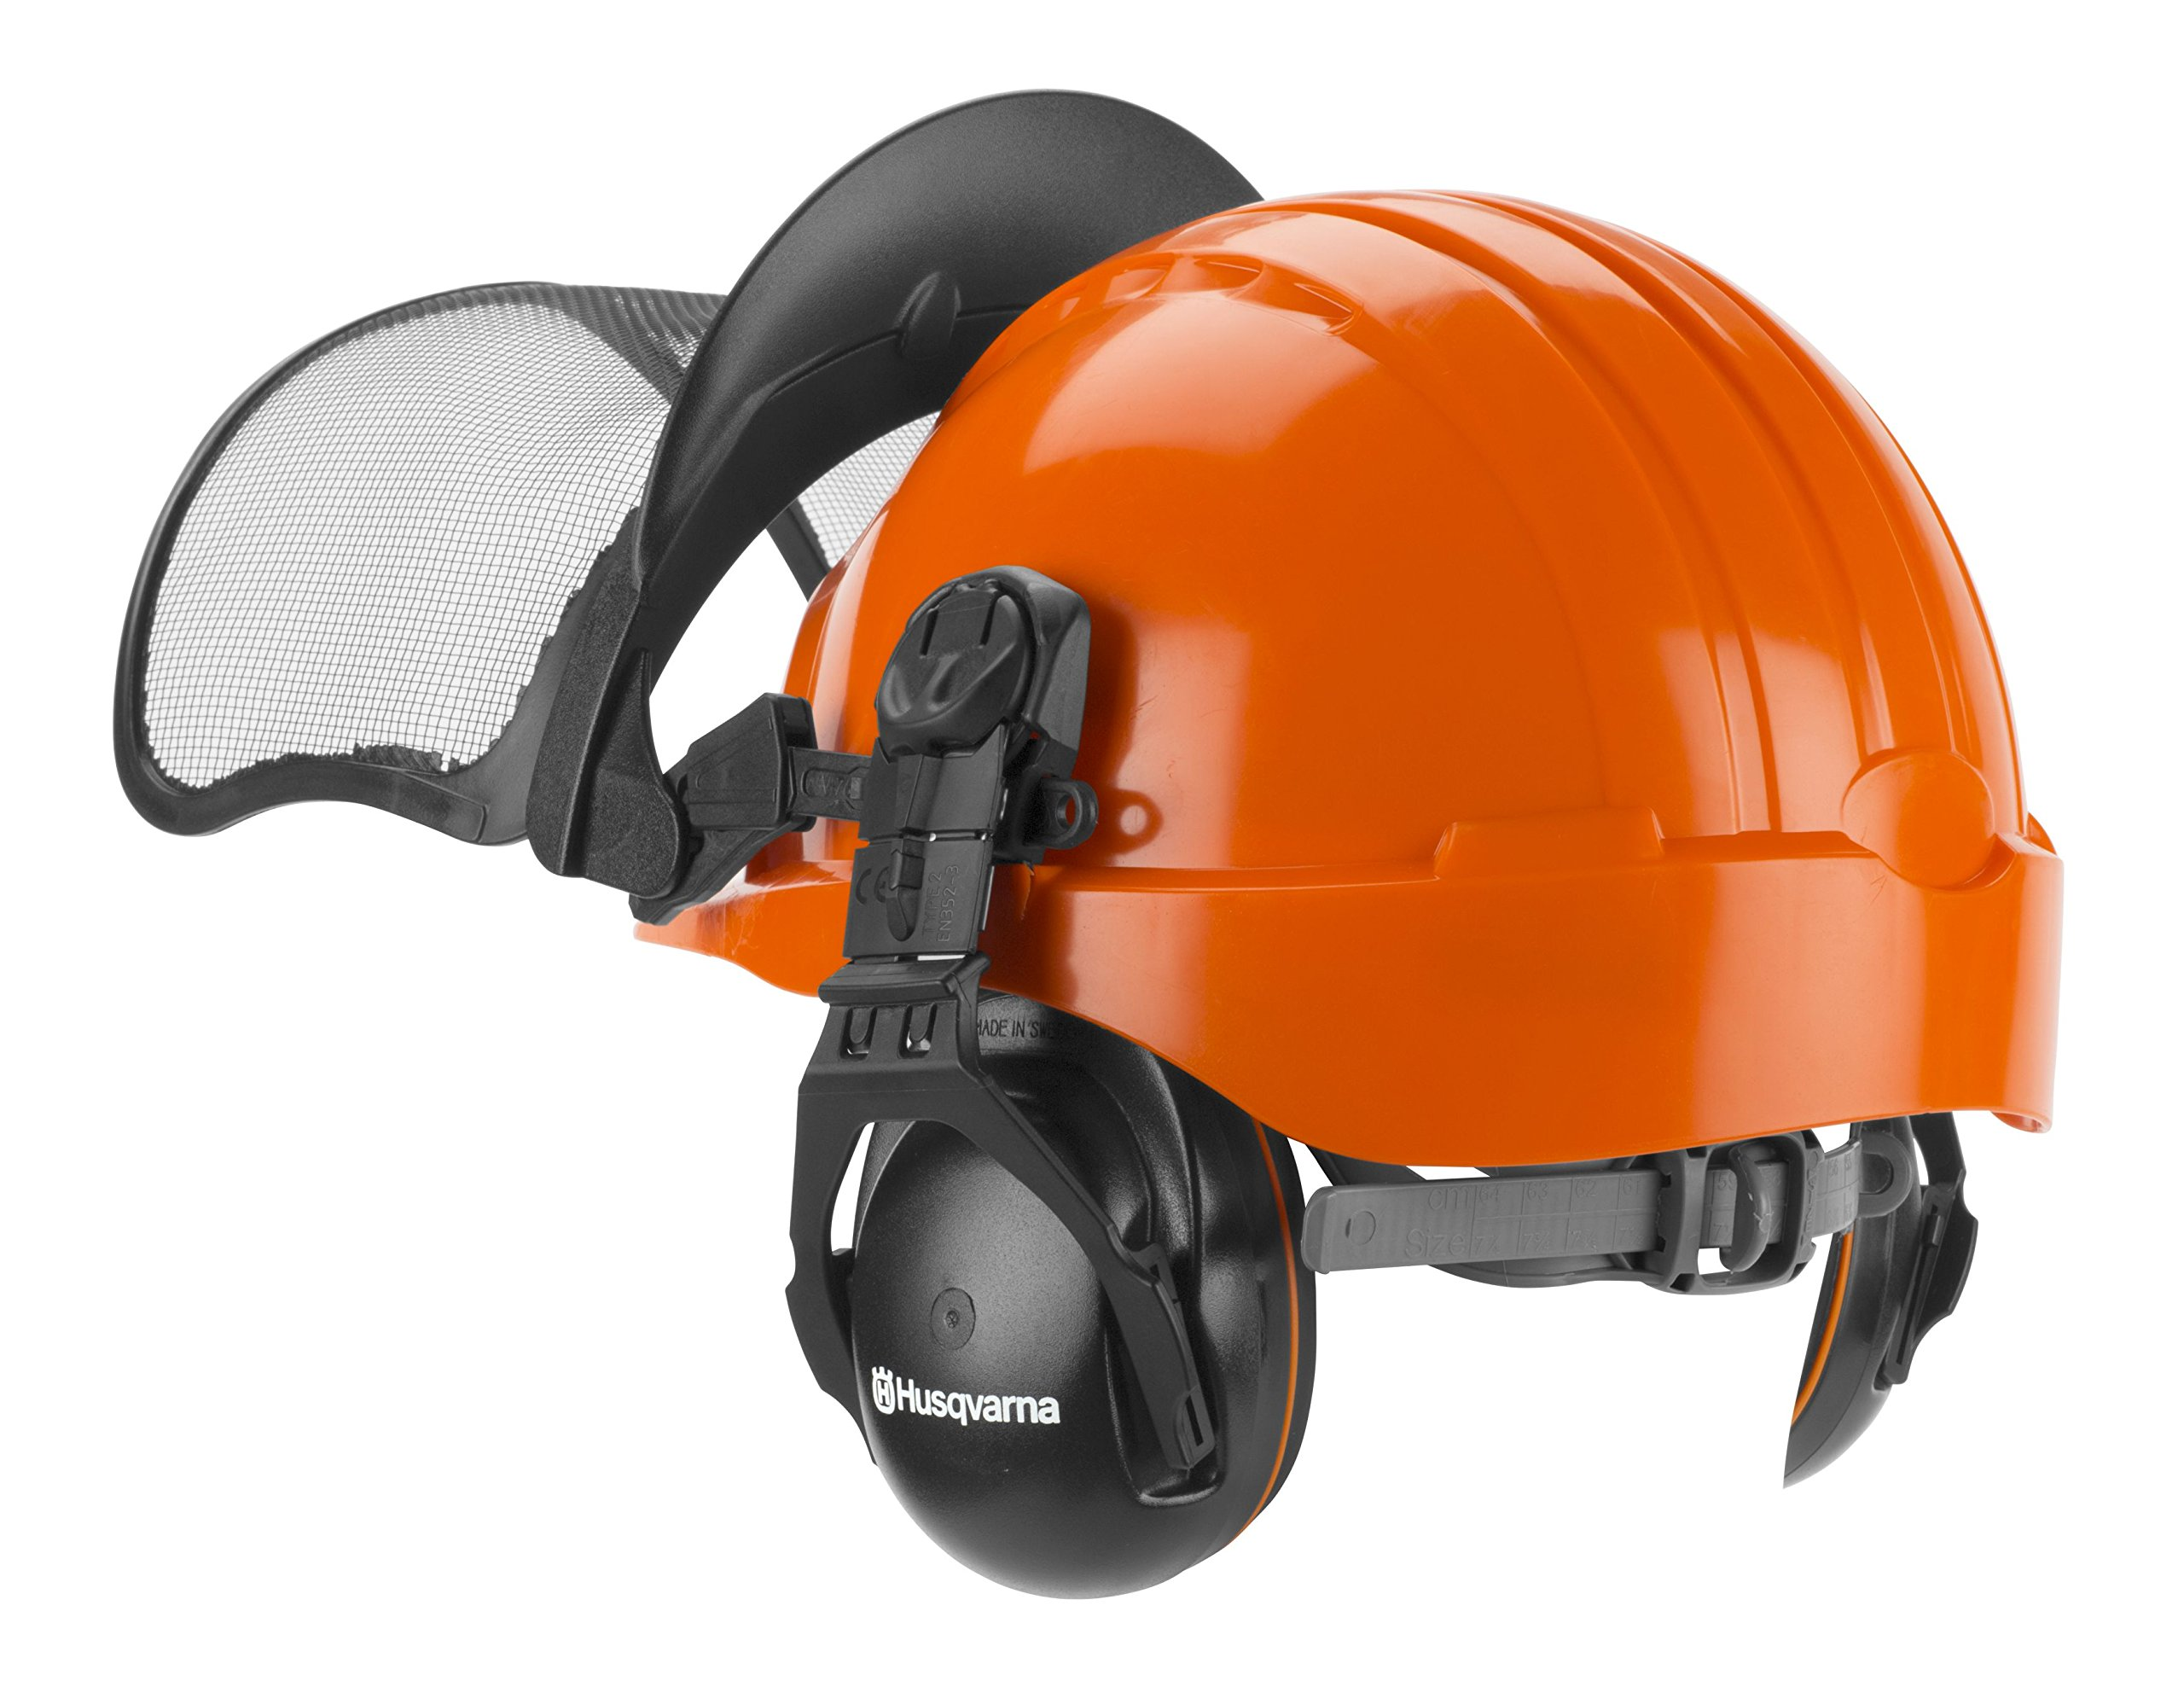 Husqvarna 592752601 Forest Head Protection Helmet by Husqvarna (Image #6)